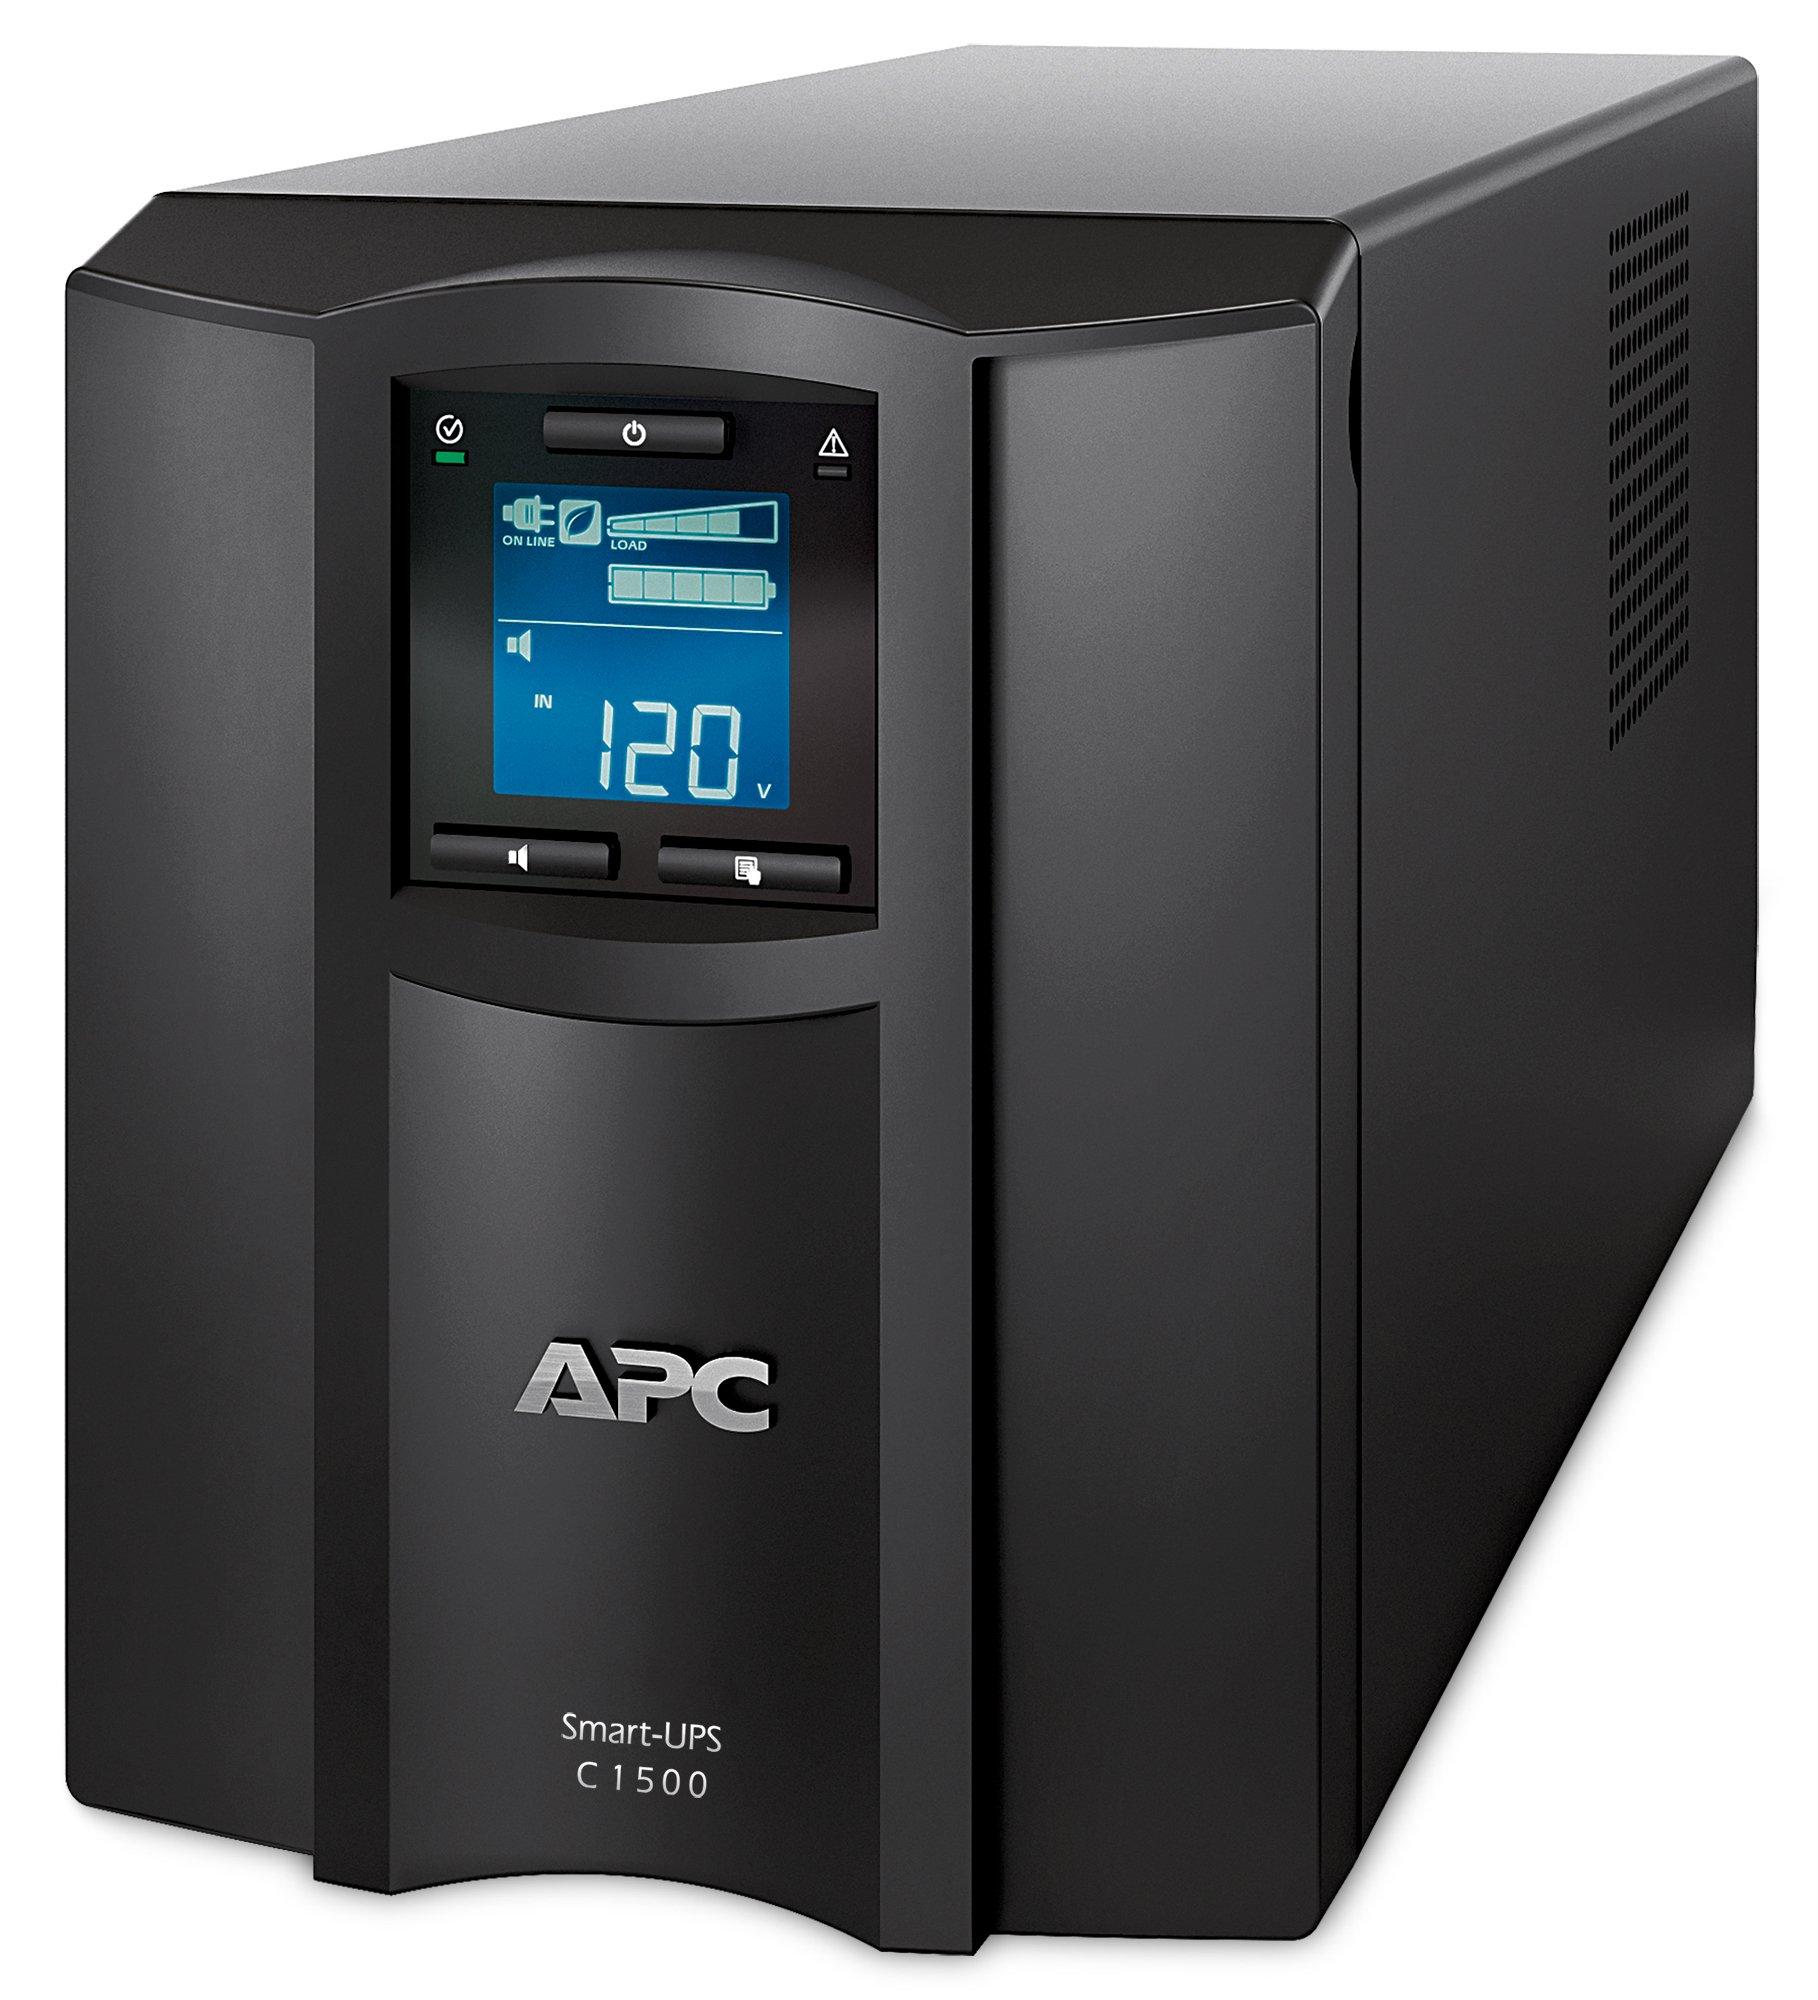 APC 1500VA Smart-UPS with SmartConnect, Pure Sine Wave UPS Battery Backup & Surge Protection (SMC1500C) by APC (Image #1)